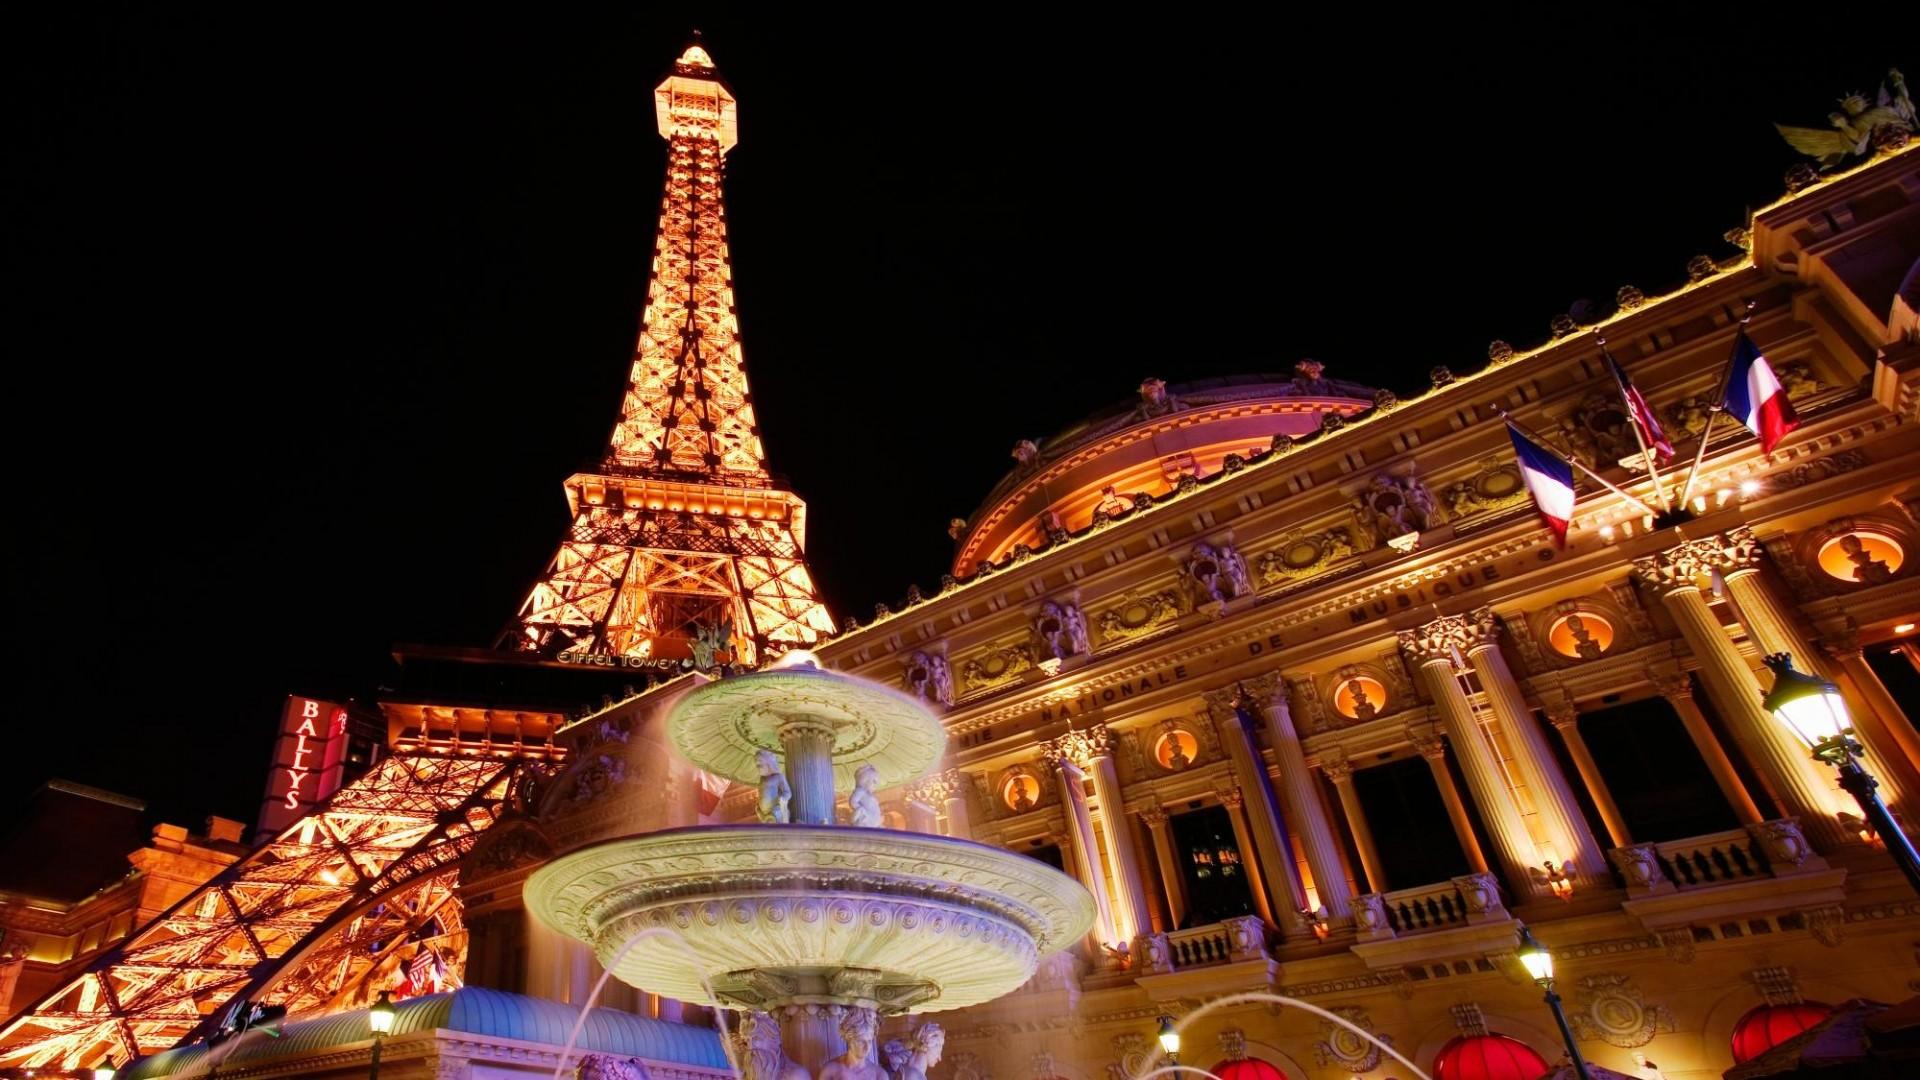 Hotel Las Vegas Hd Wallpaper